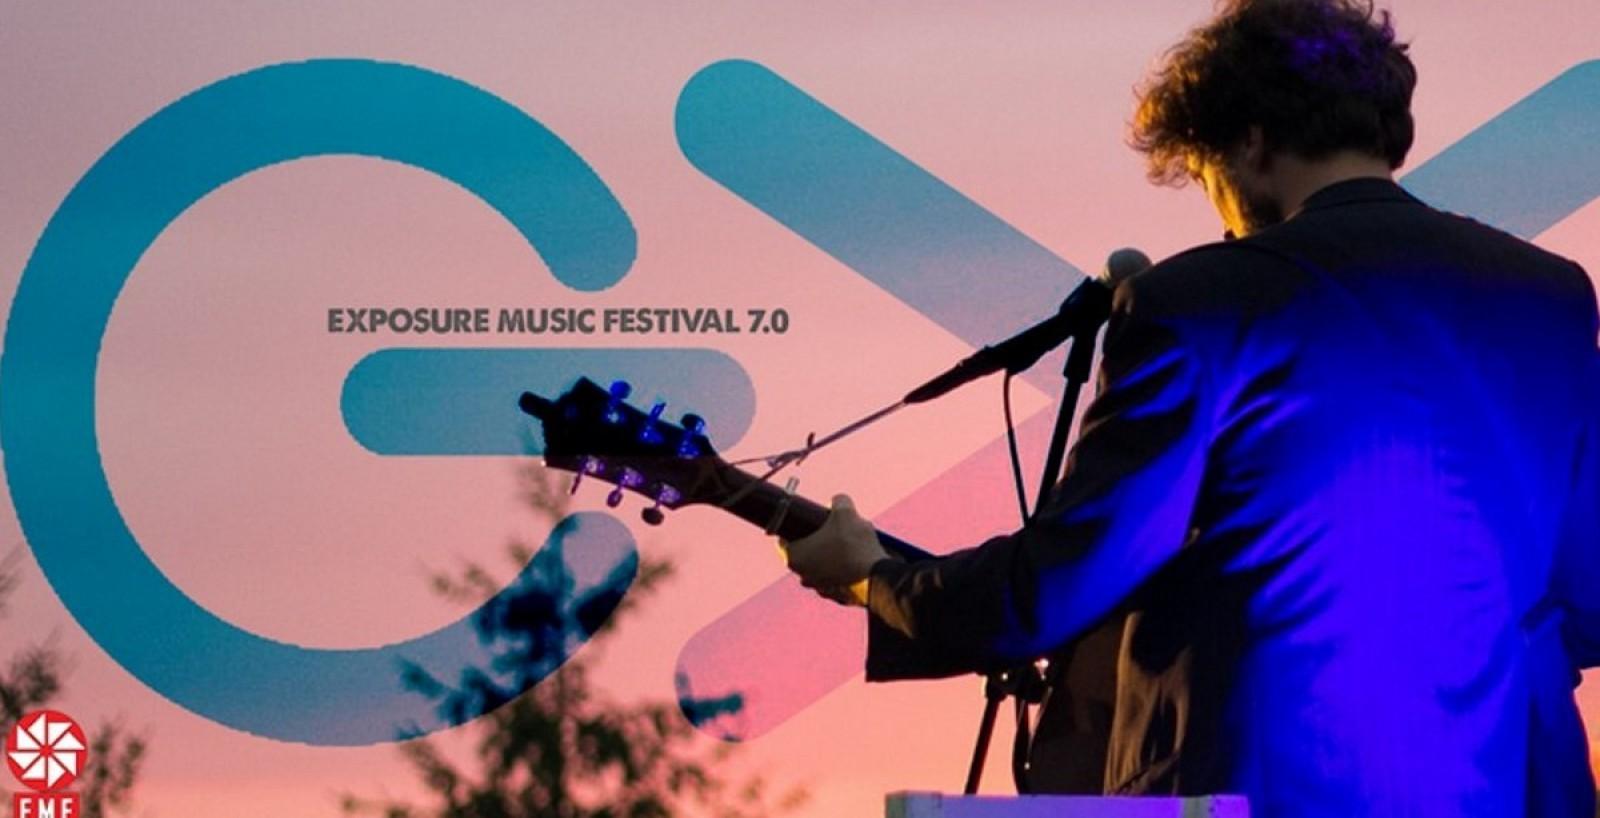 Exposure music festival dovodi Zorana Predina